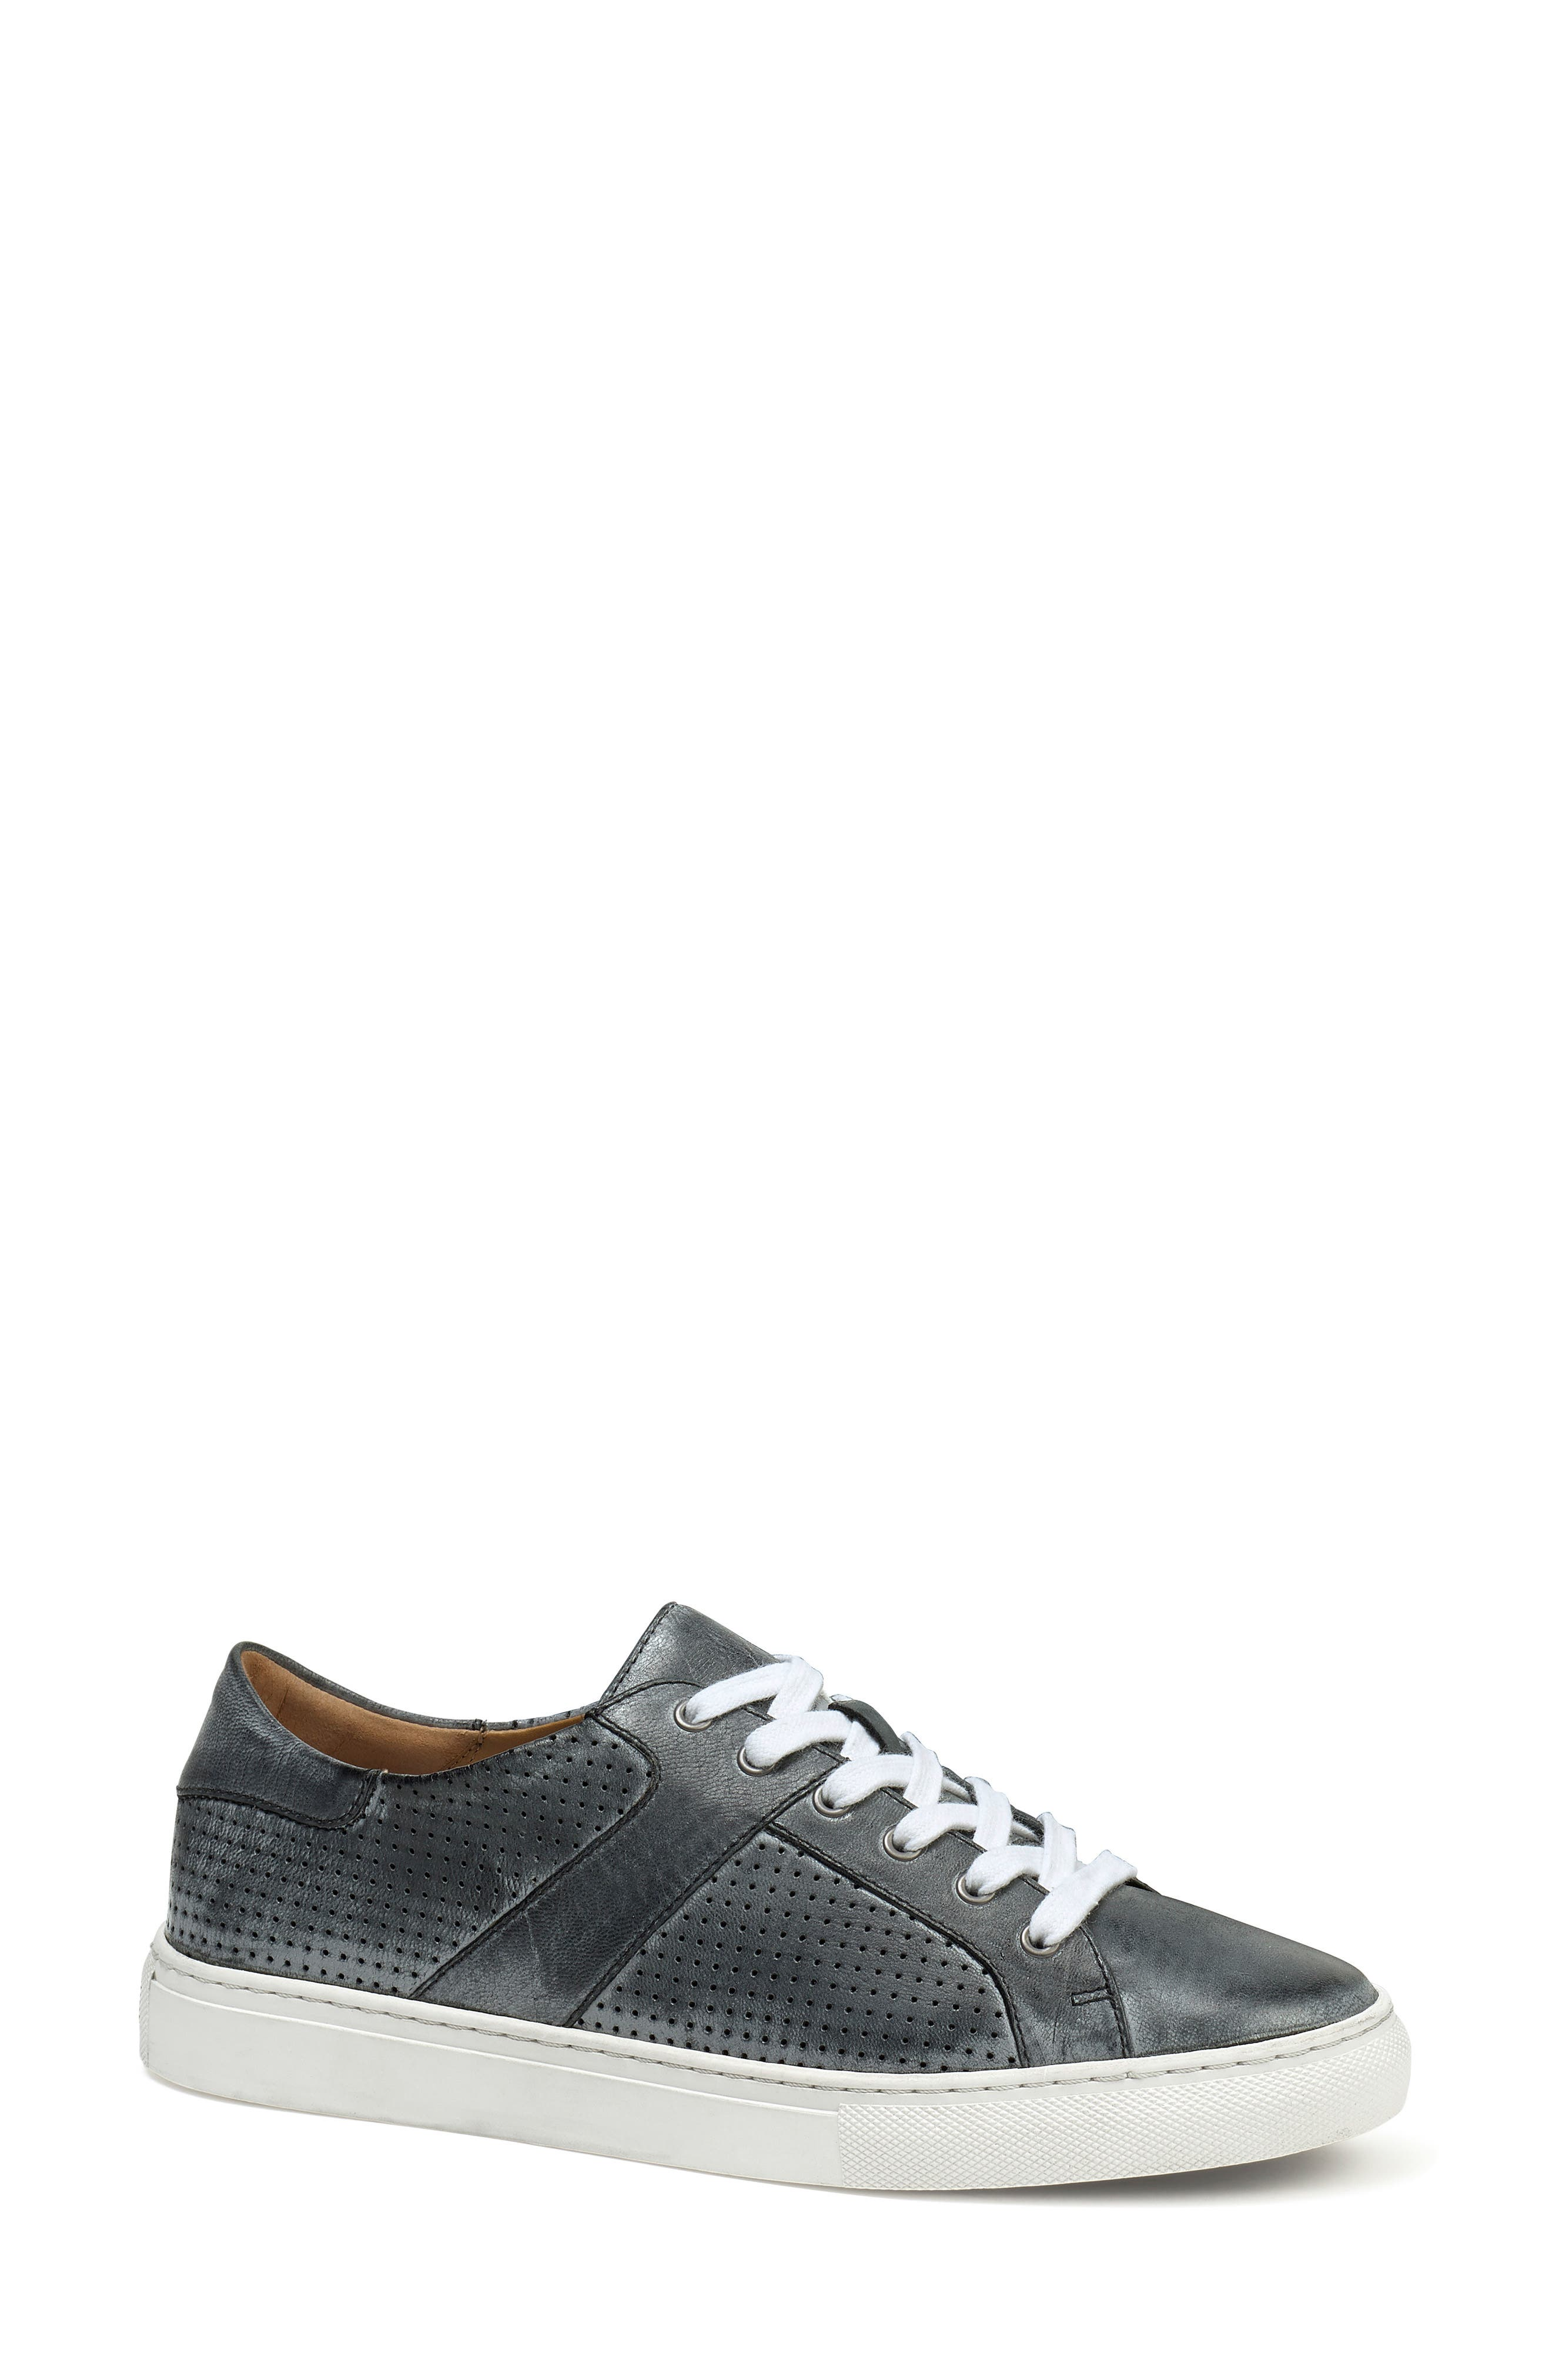 Trask Lindsey Sneaker, Grey